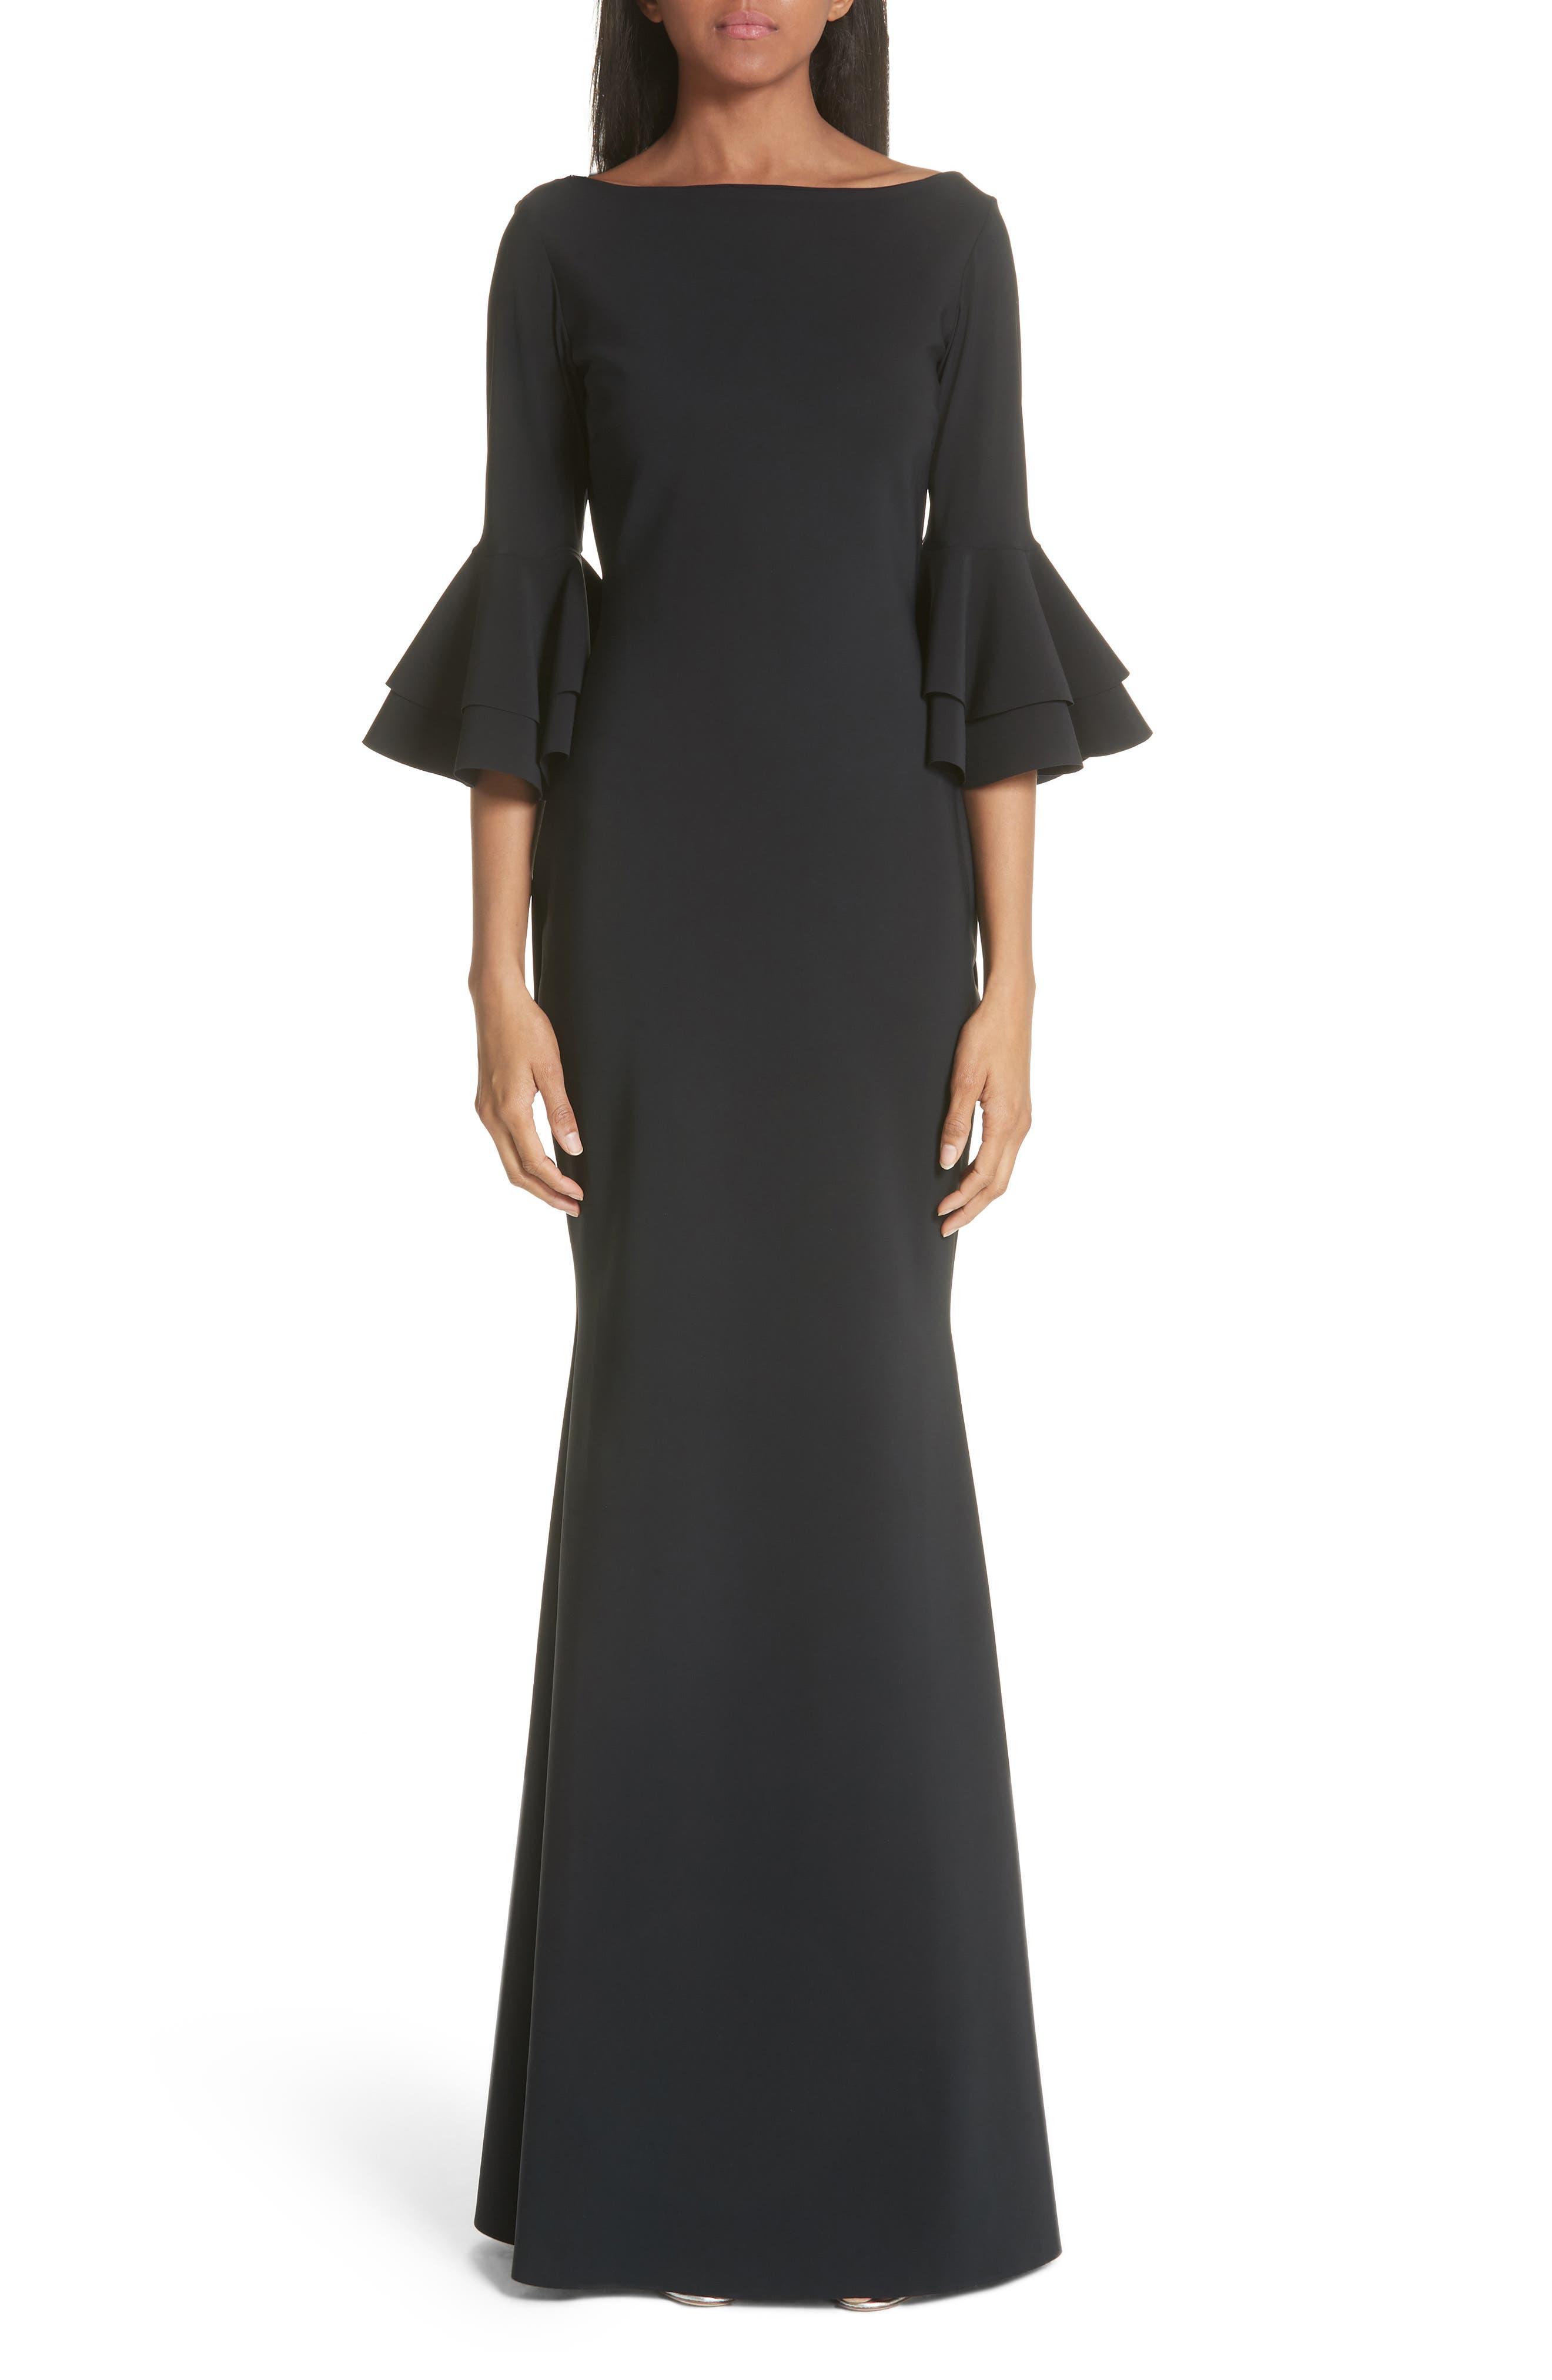 Chiara Boni La Petite Robe Iva Ruffle Bell Sleeve Gown, 6 IT - Black